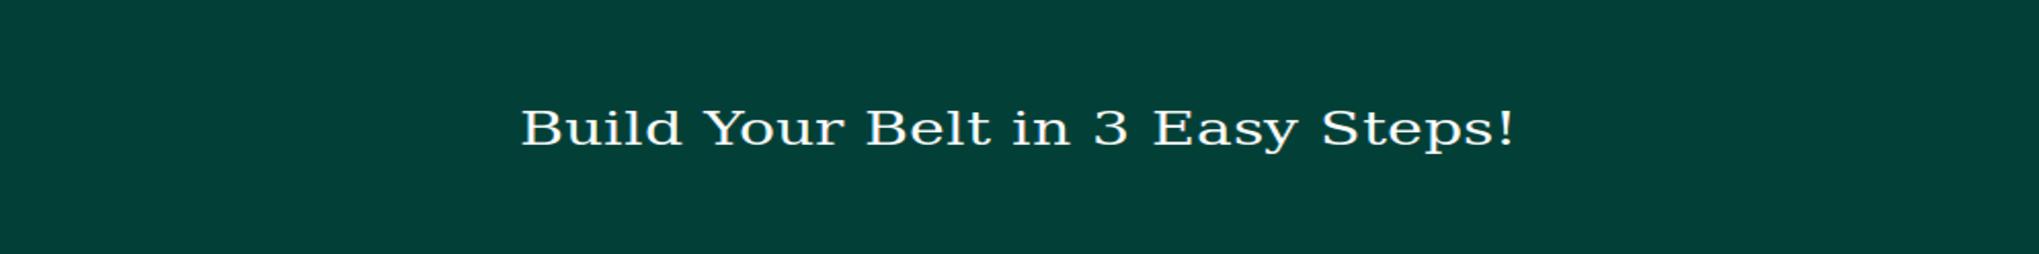 Build Your Own Belt